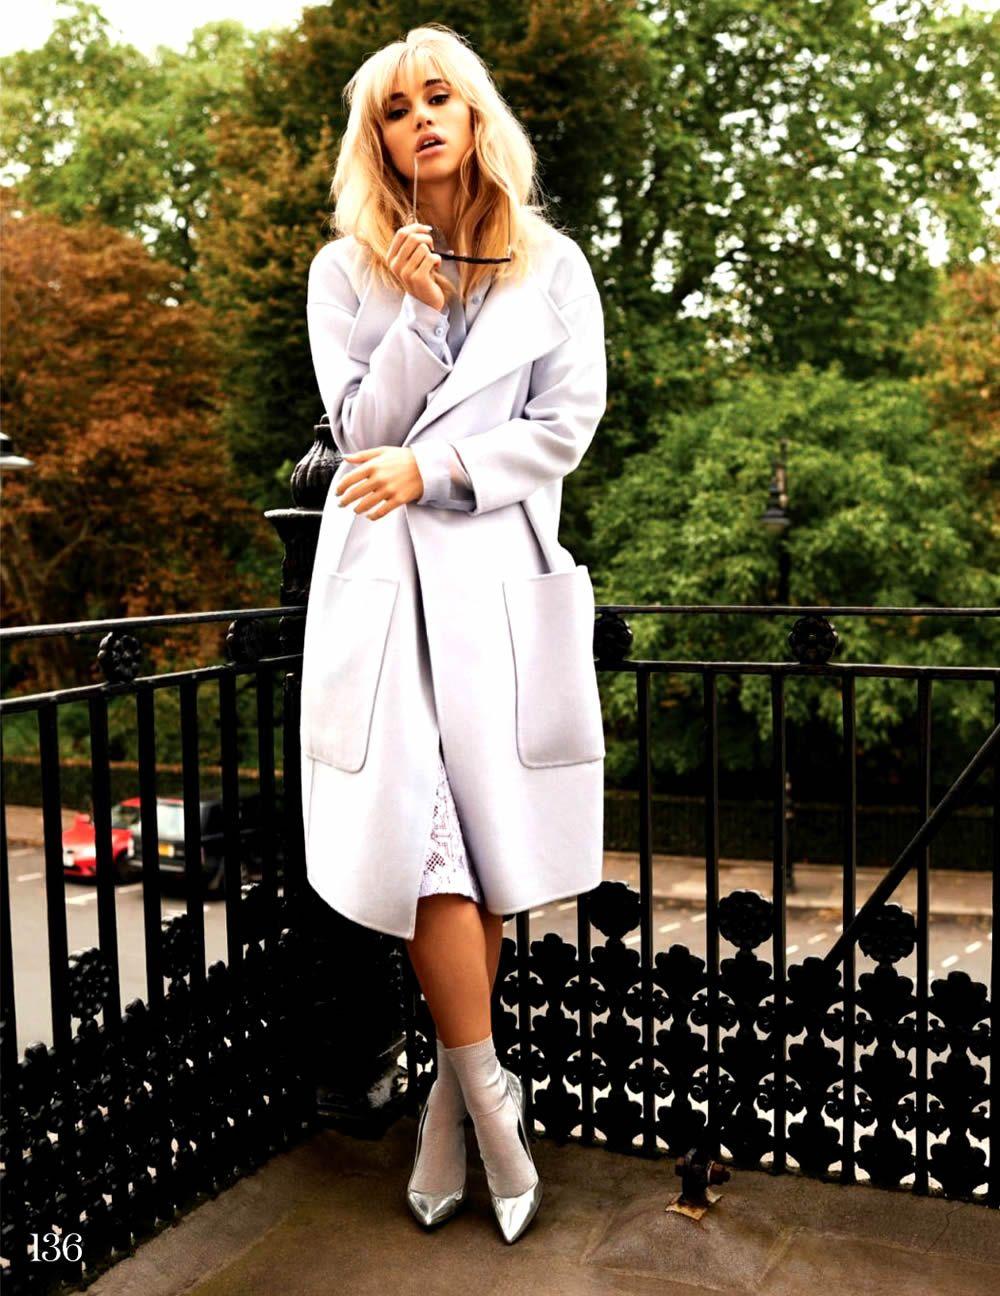 suki waterhouse elle uk 7 Elle UK January 2014   Suki Waterhouse by David Vasiljevic  [Cover+Editorial]